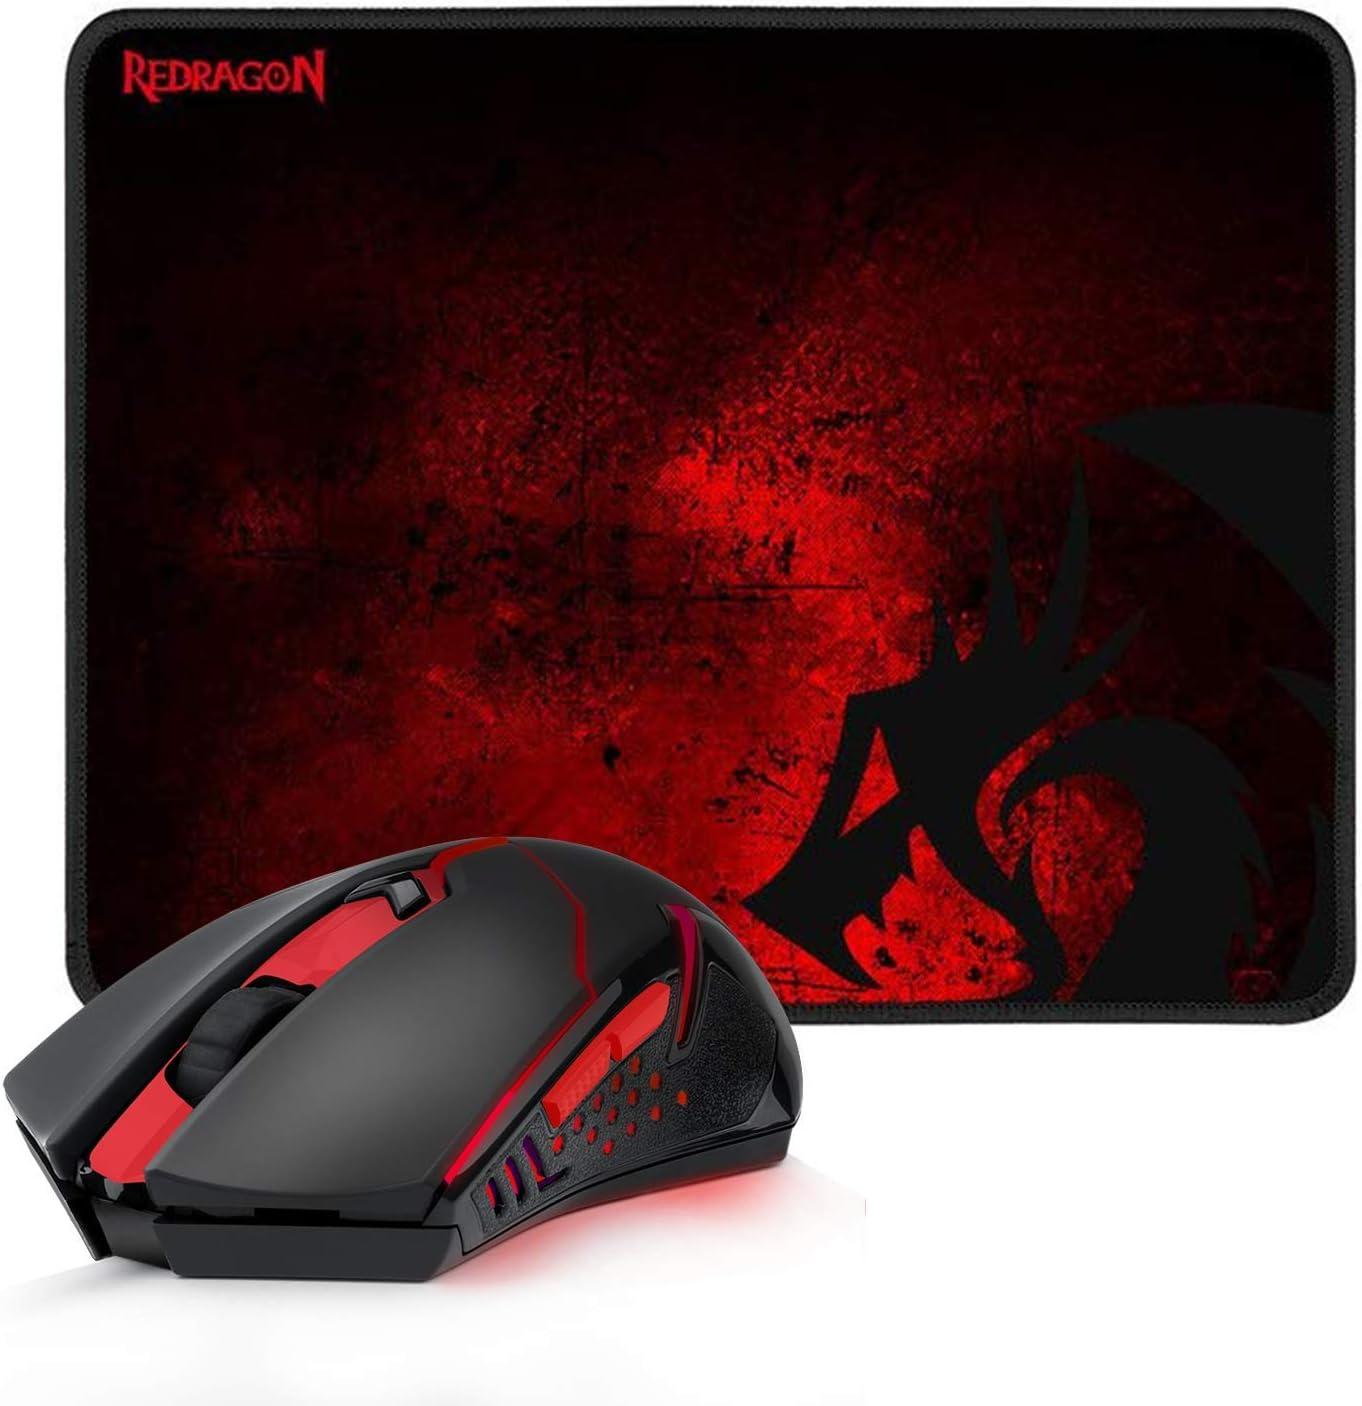 Redragon M601-WL Pack gaming Alfombrilla y ratón inalámbrico 3200 DPI, Sensor Pixart, Wireless 2.4 Ghz, Iluminación roja, mouse pad tipo speed. Combo gamer para PC y Laptop